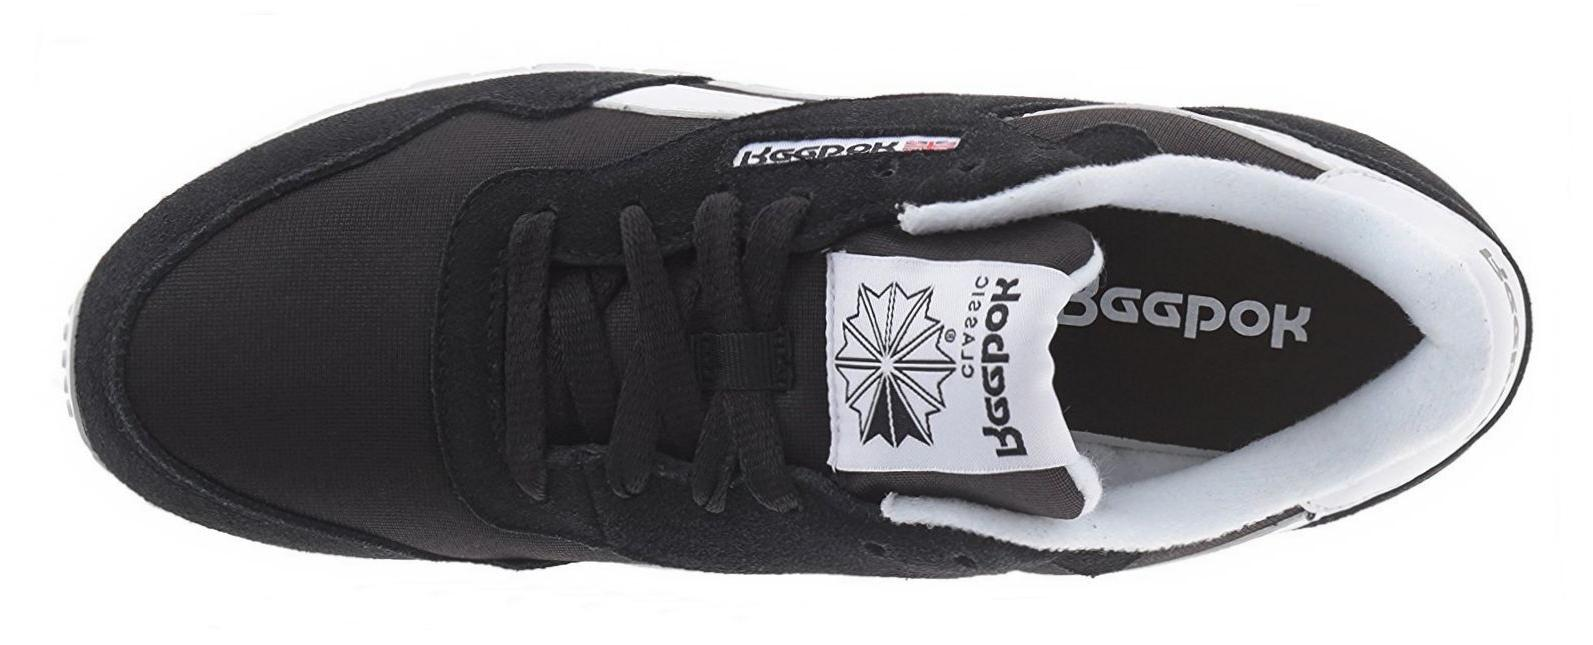 Reebok Classic Royal Black White Mens Tennis Shoes